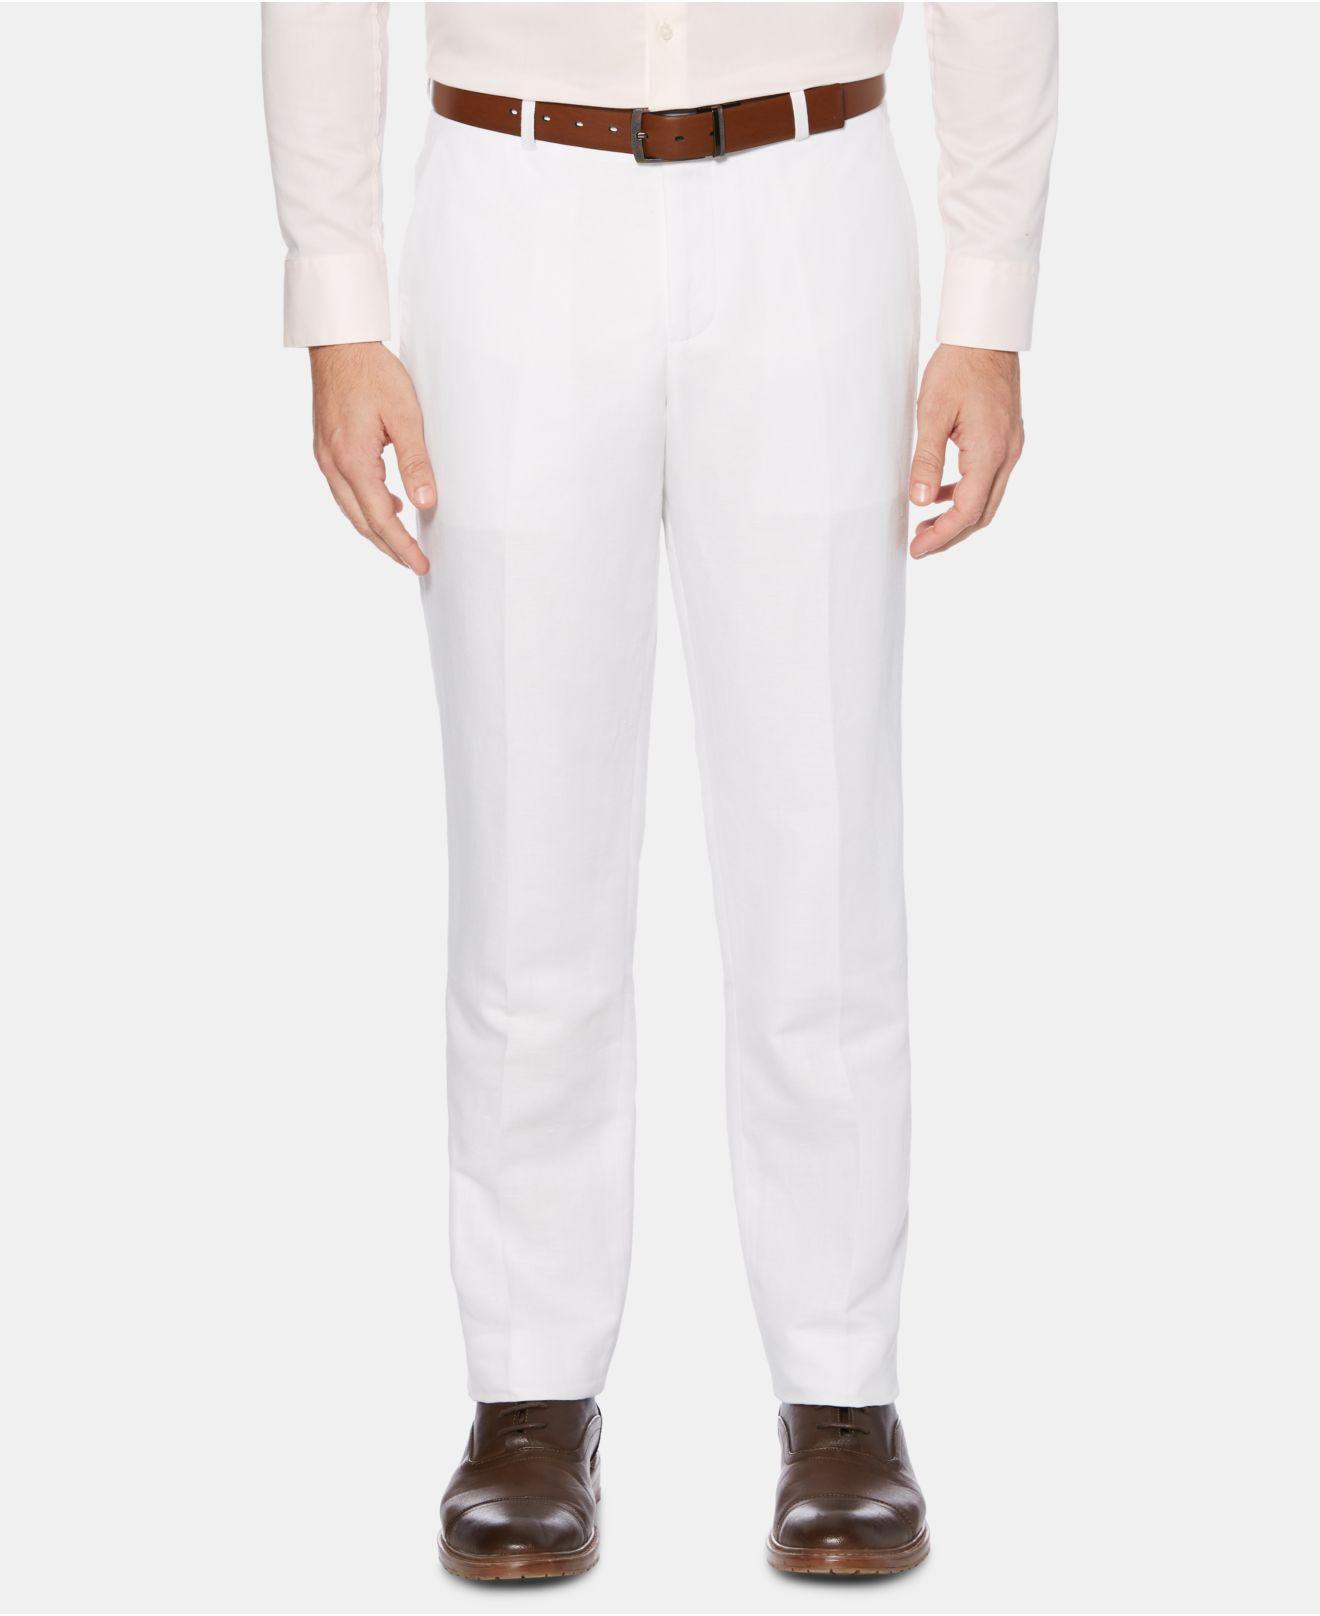 f4d58620 Perry Ellis Mens Modern Fit Dress Pants – DACC